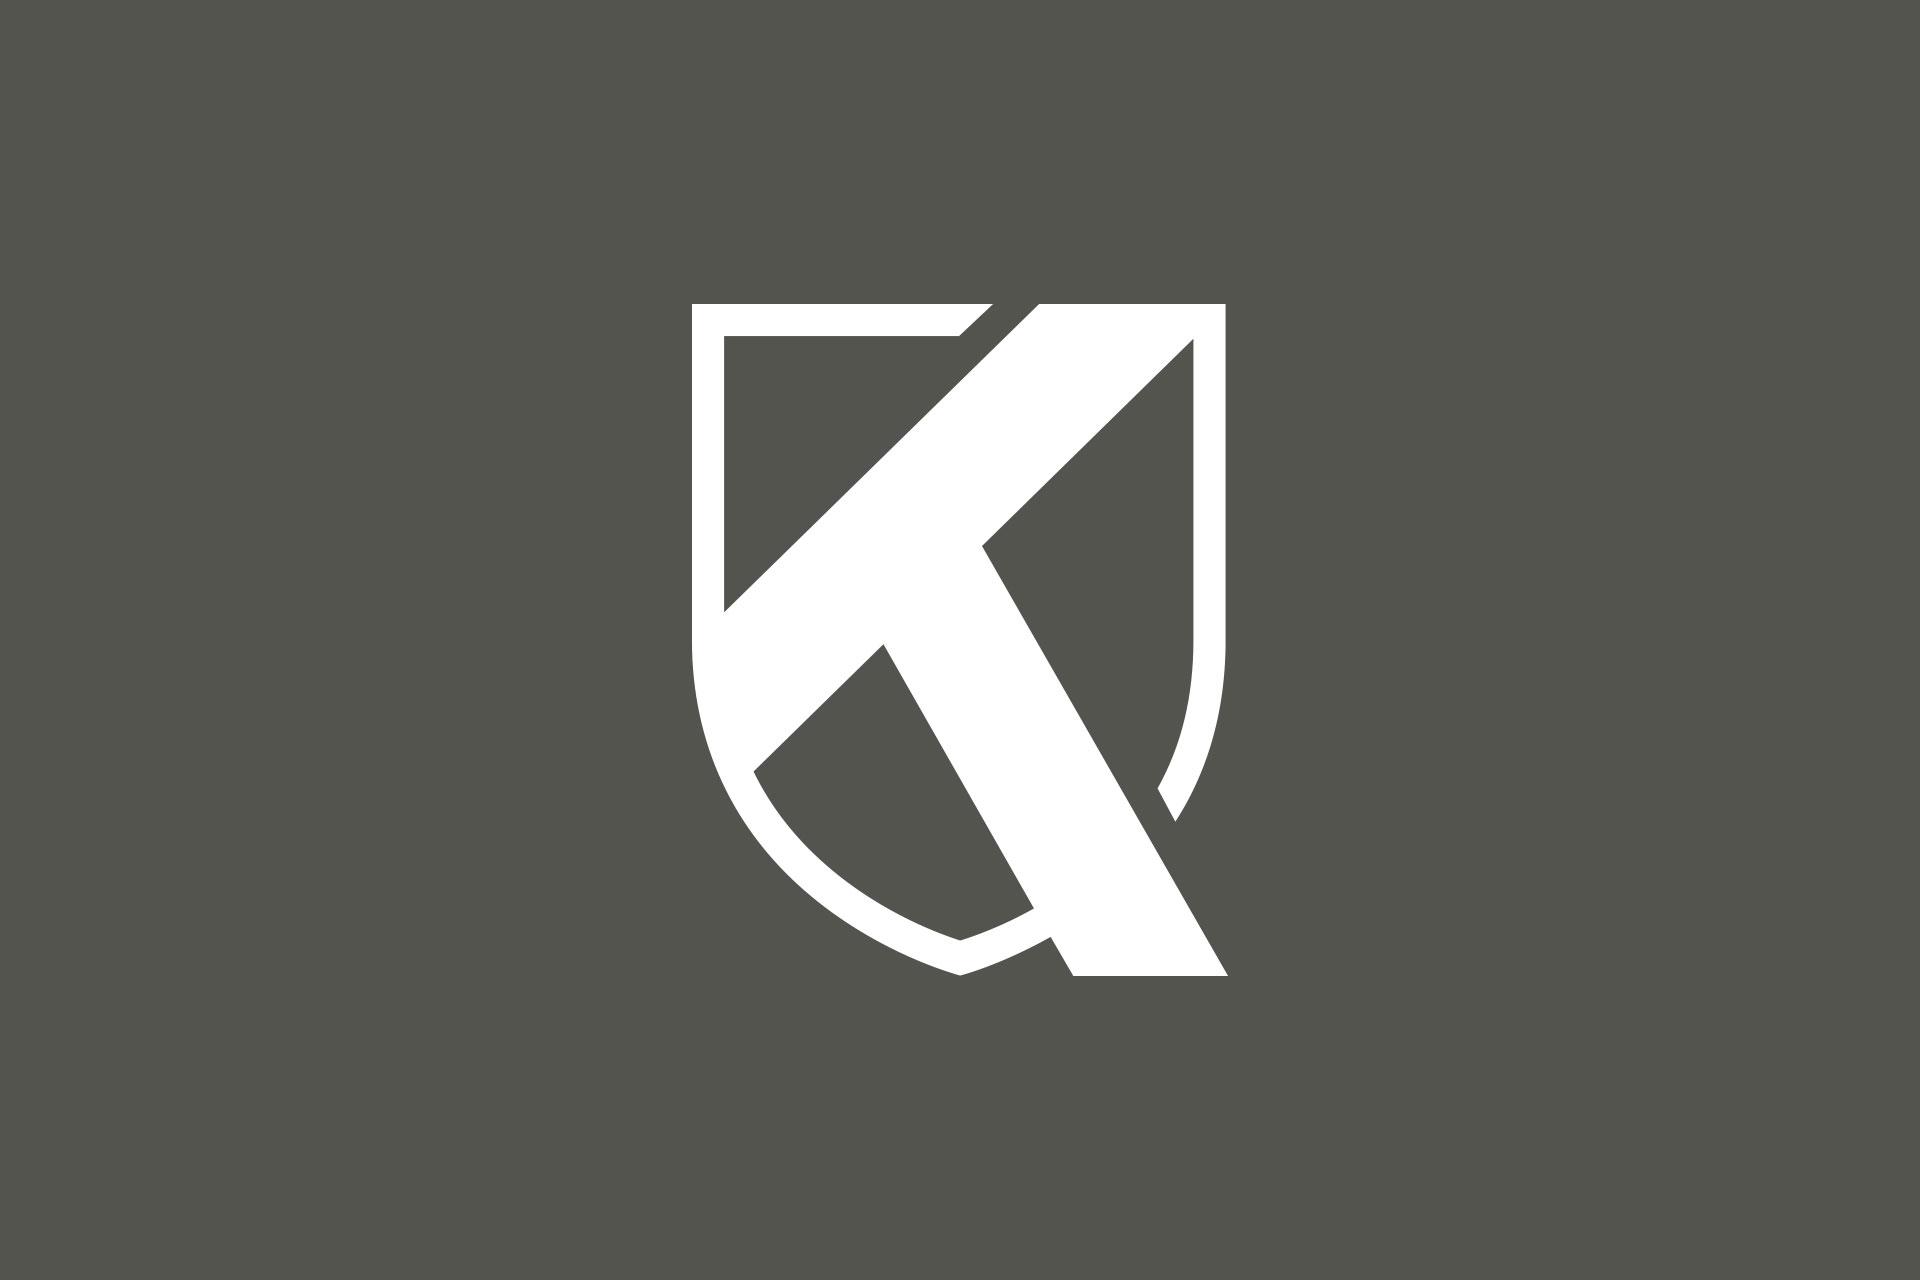 acme-logo-k_studios.jpg